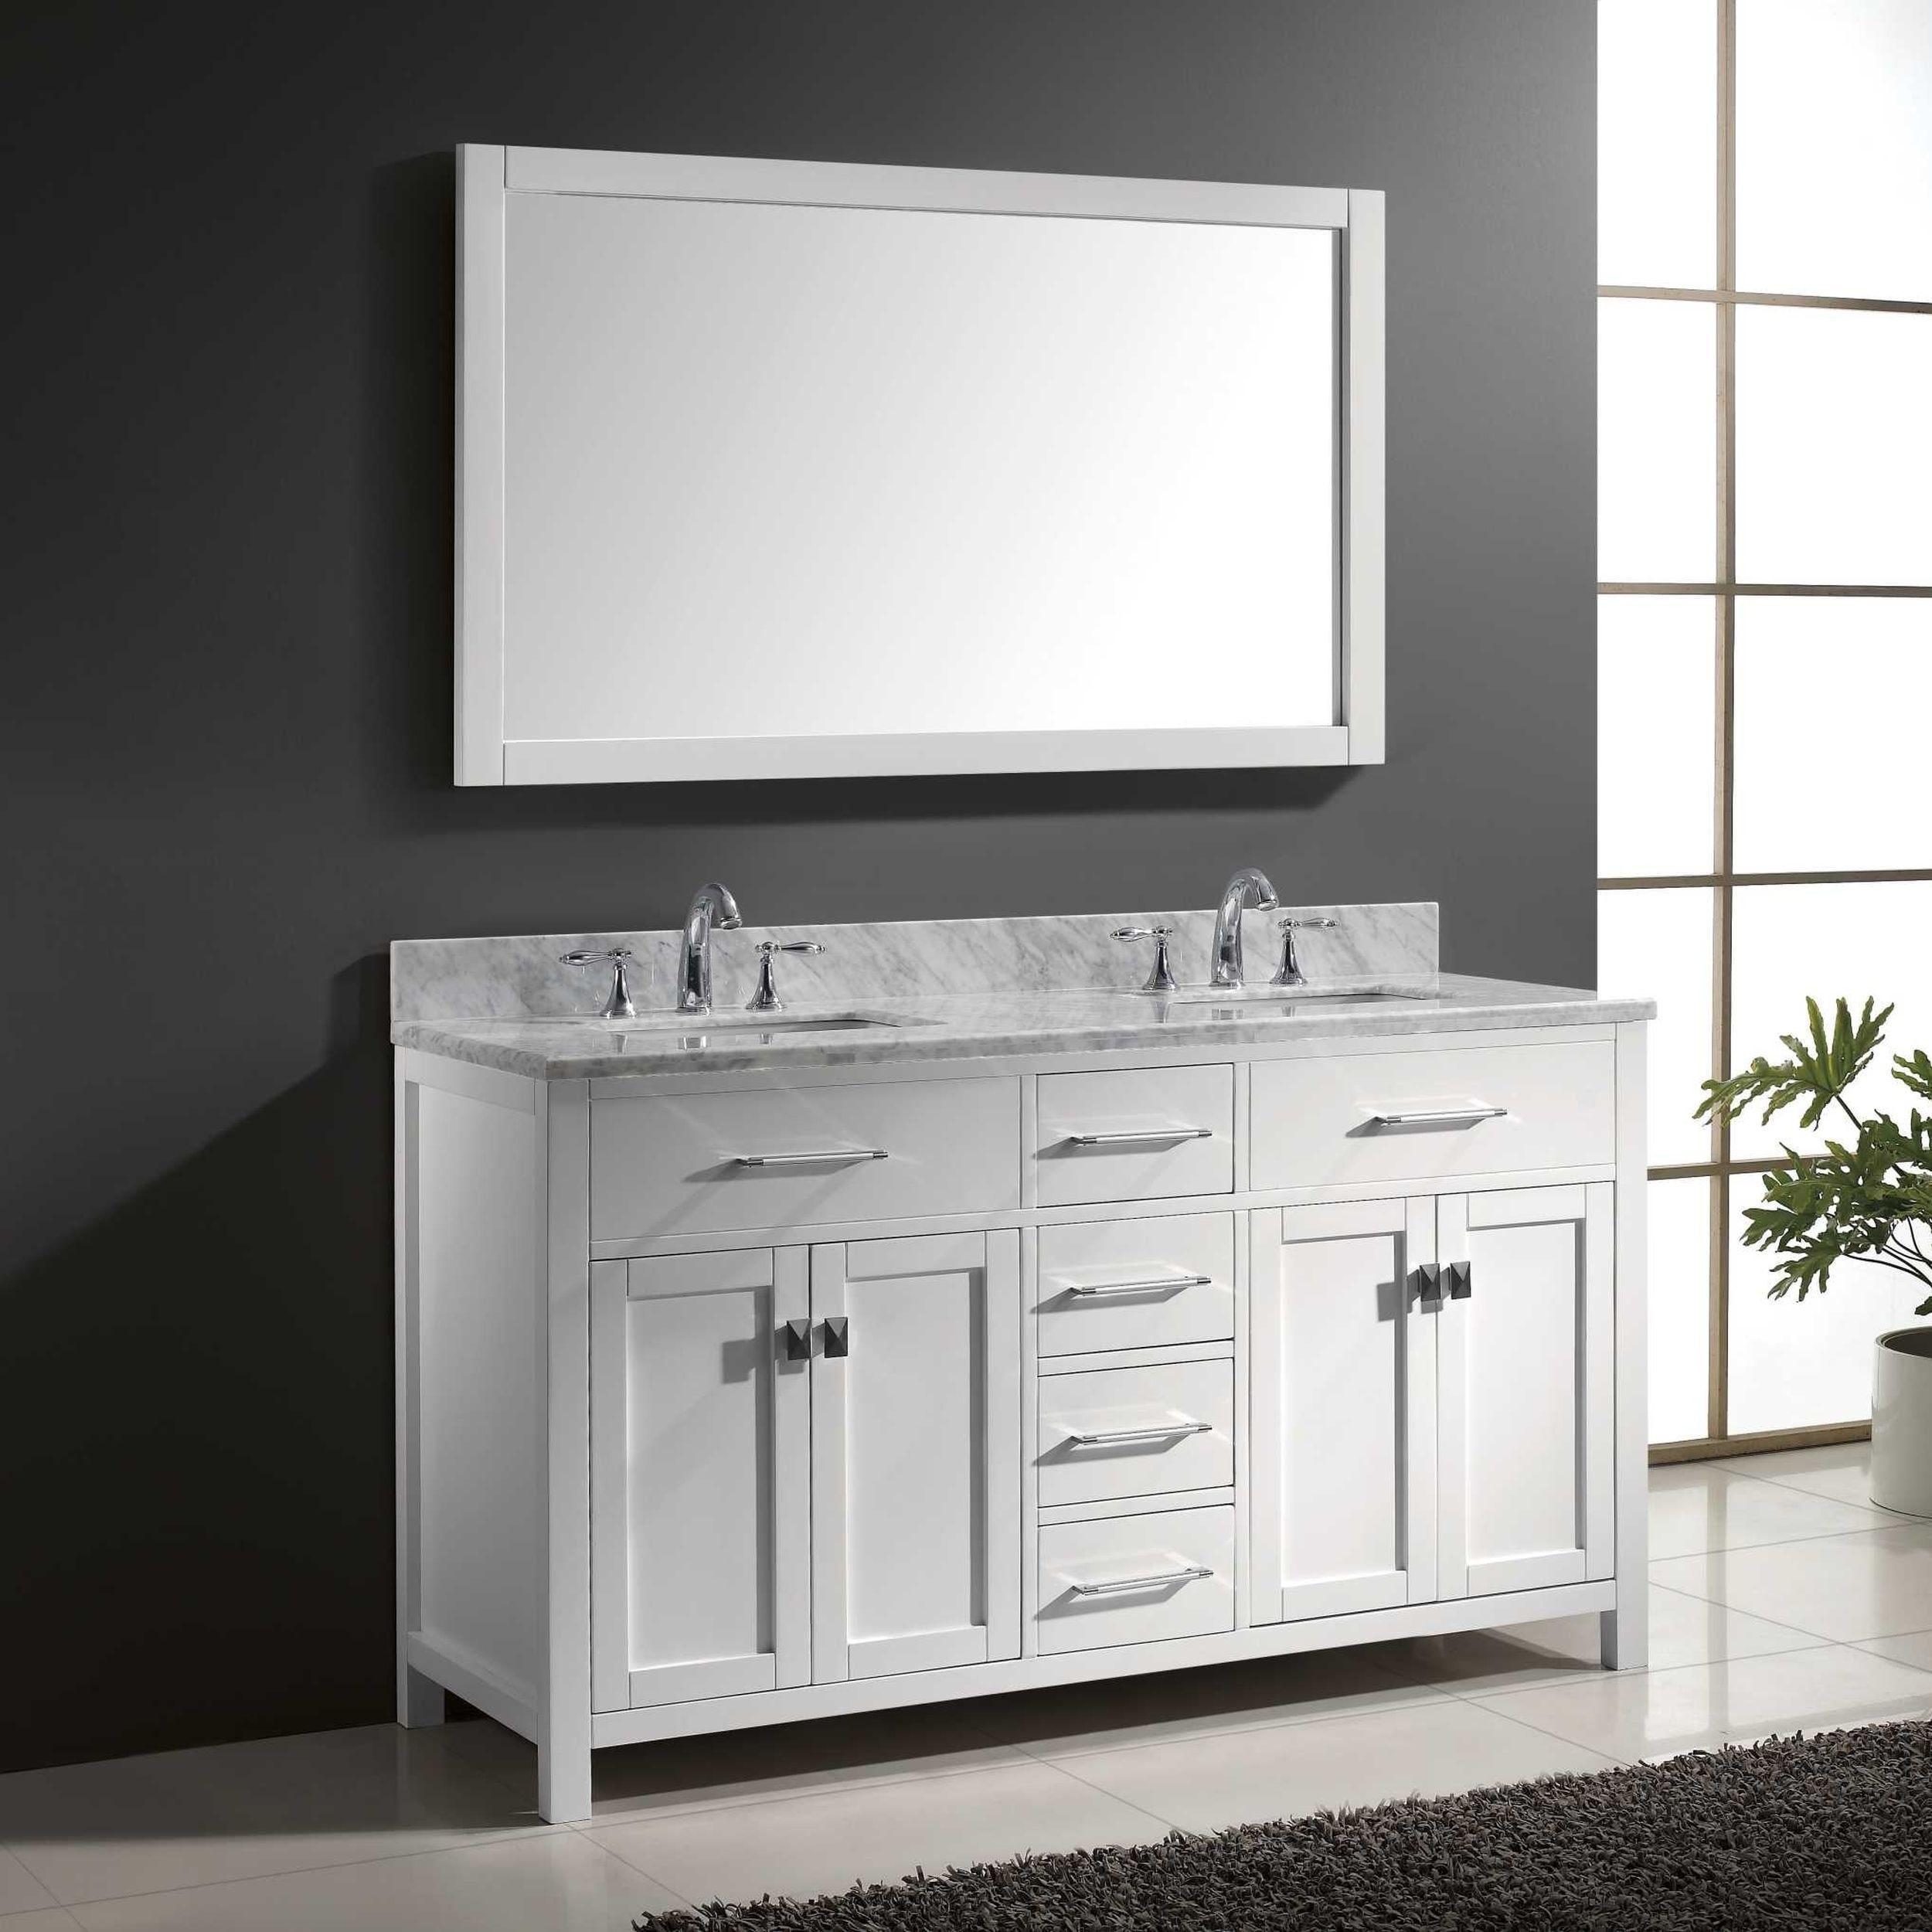 Bathroom Mirrors Bath   Shop our Best Home Improvement Deals Online ...